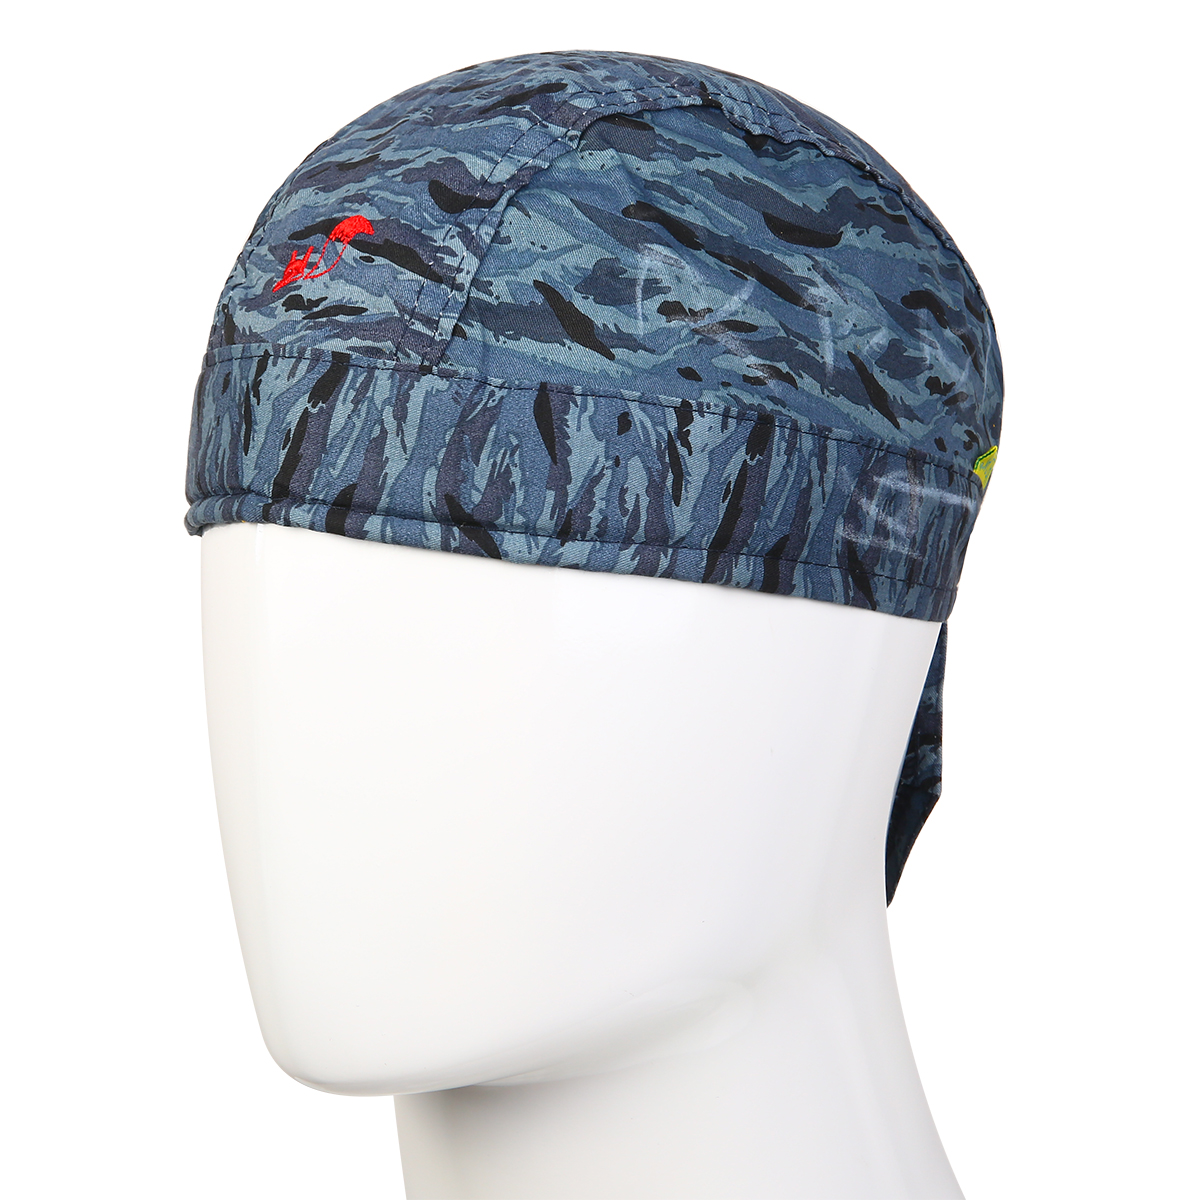 1pc Welder Welding Protective Hat Cap Scarf Welder Flame Retardant Cotton Safety Helmet With Elastic Straps Mayitr